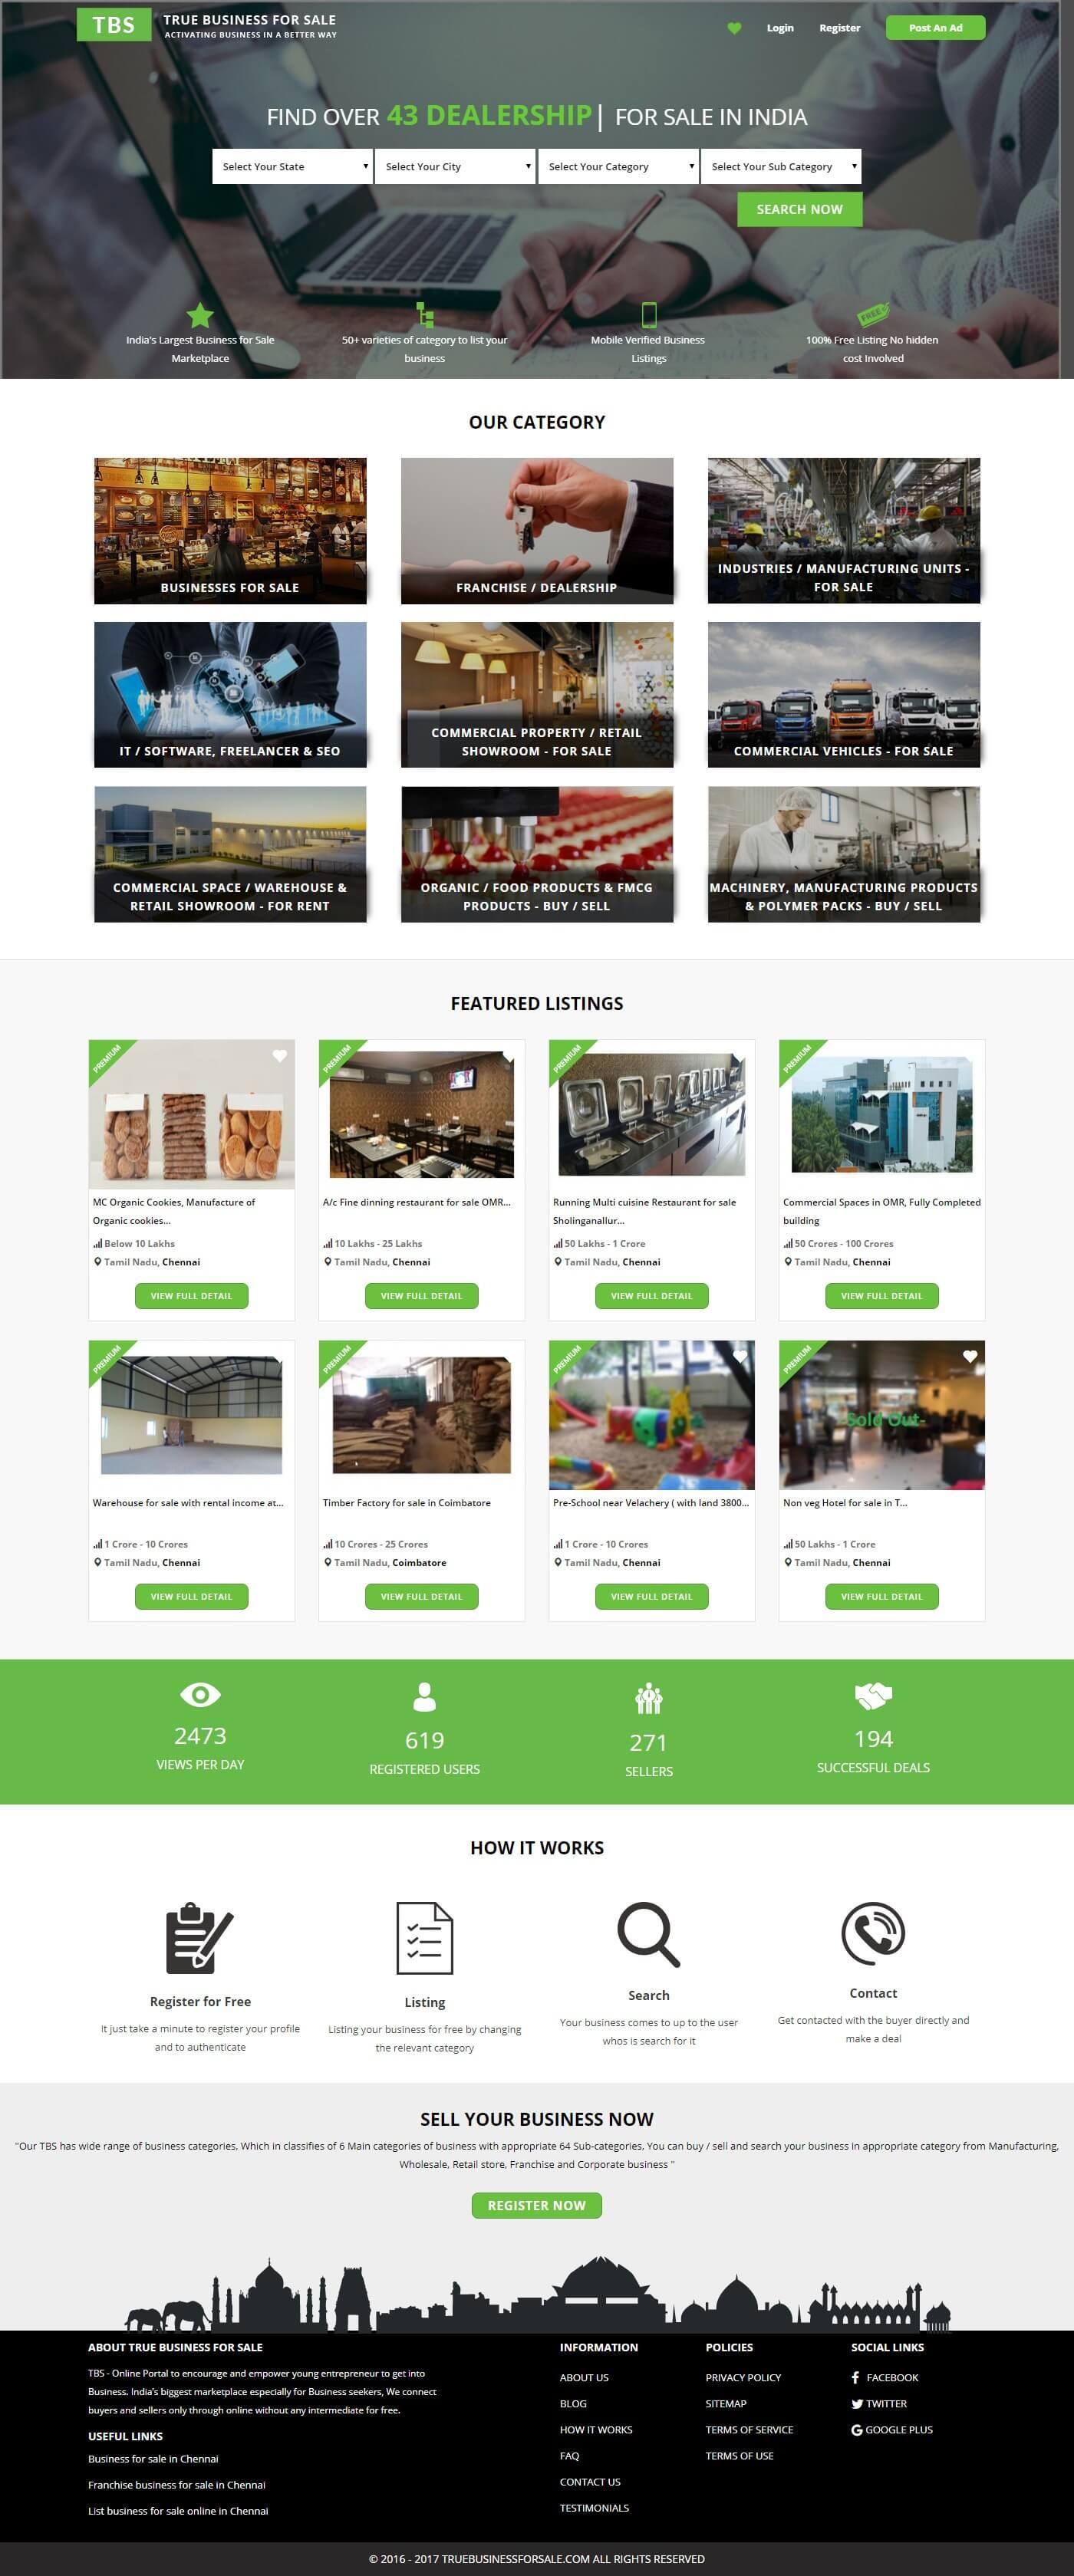 Dynamic Website Development for True Business for Sale